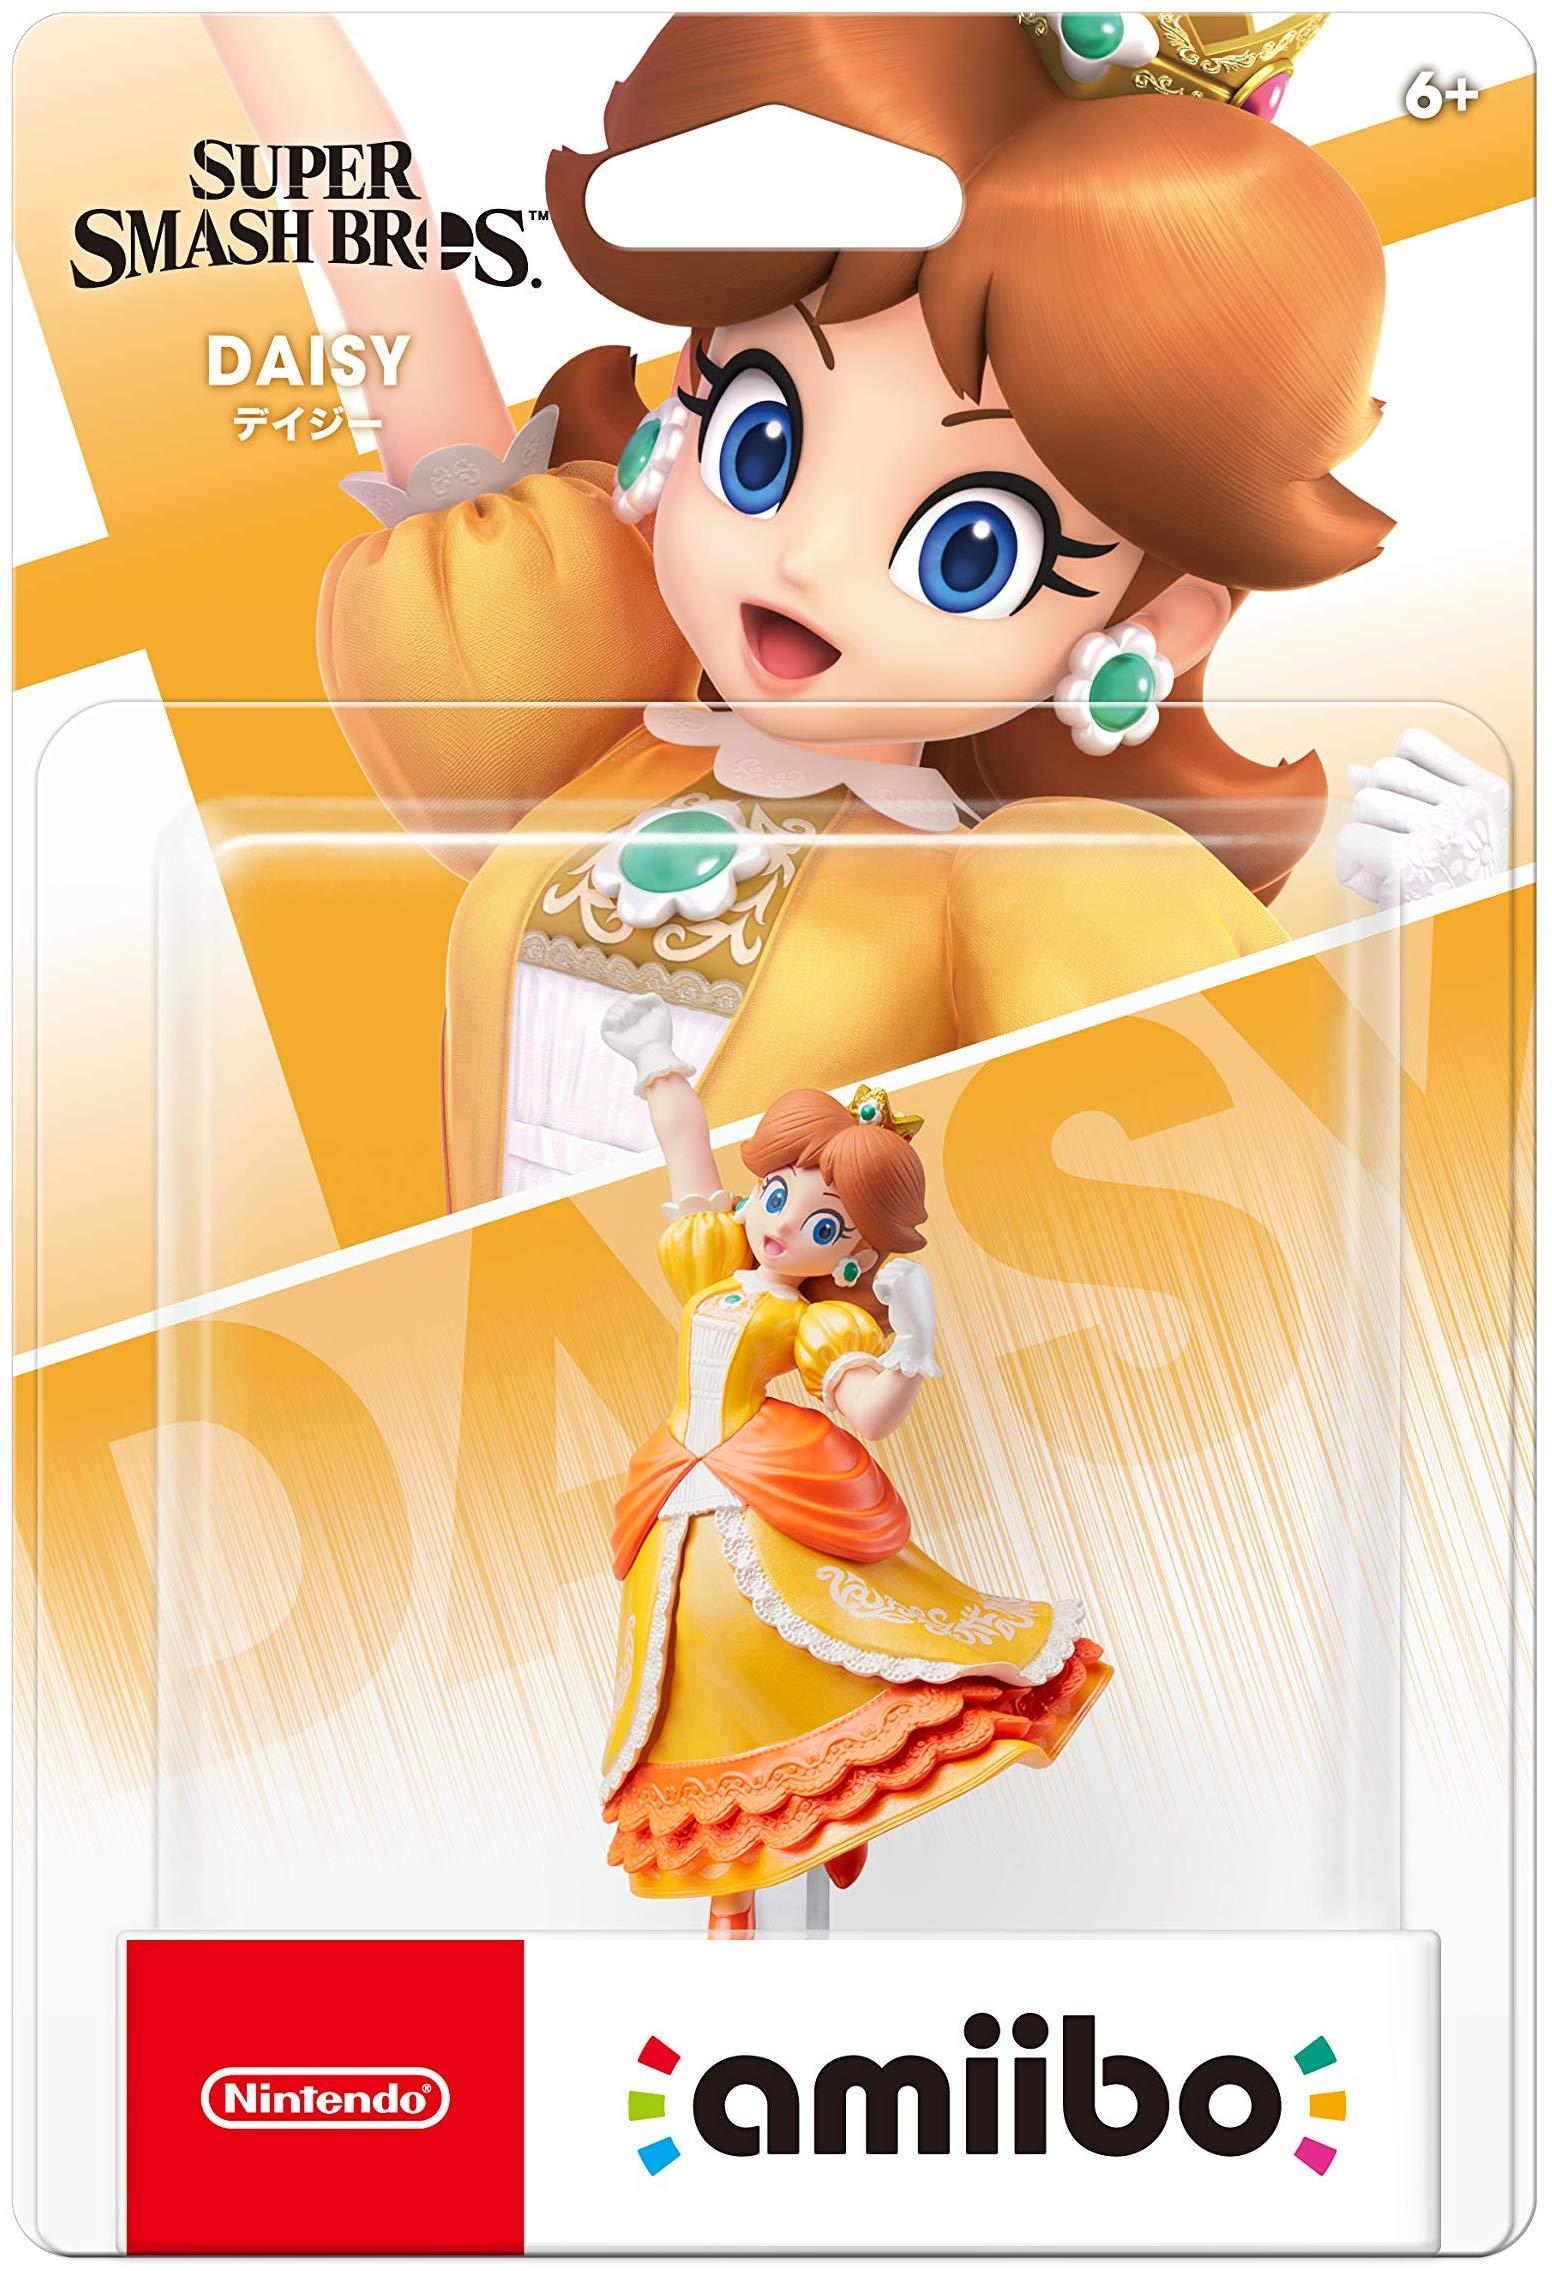 Amazon: Amiibo Daisy, Young Link, Ken Pre-orders Available + $.51 off Daisy Amiibo $15